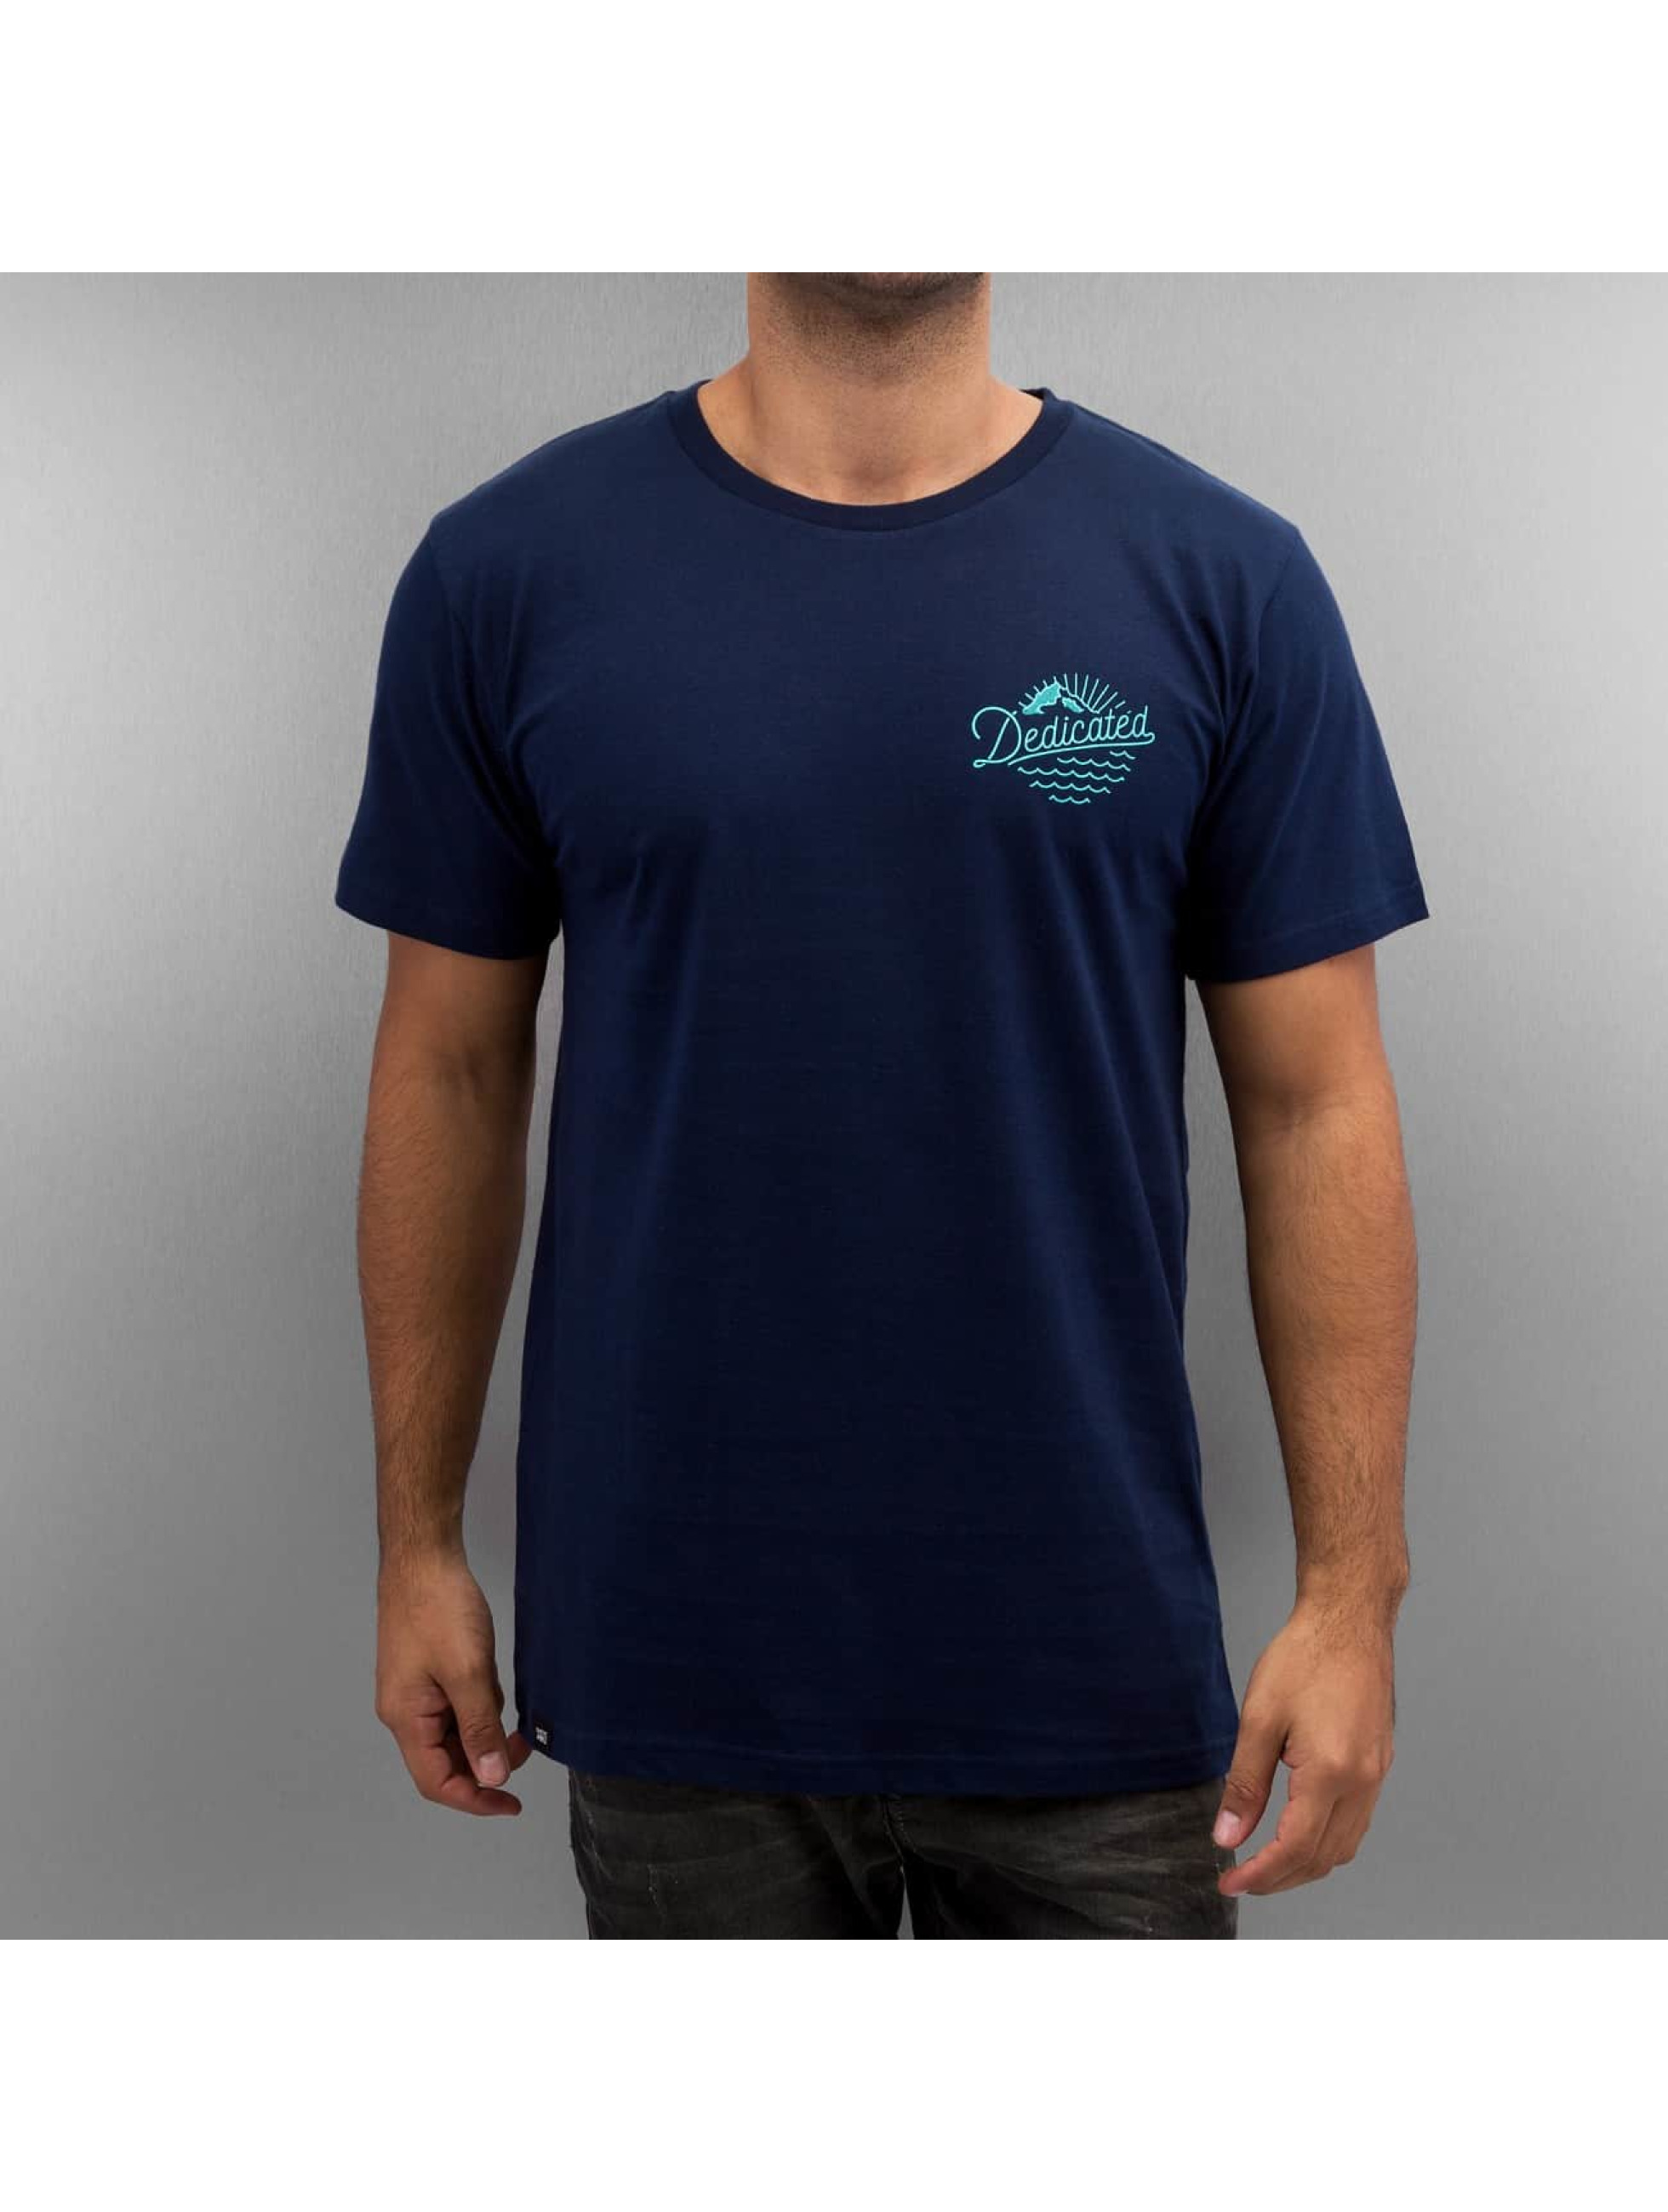 DEDICATED Männer T-Shirt Good Vibes in blau